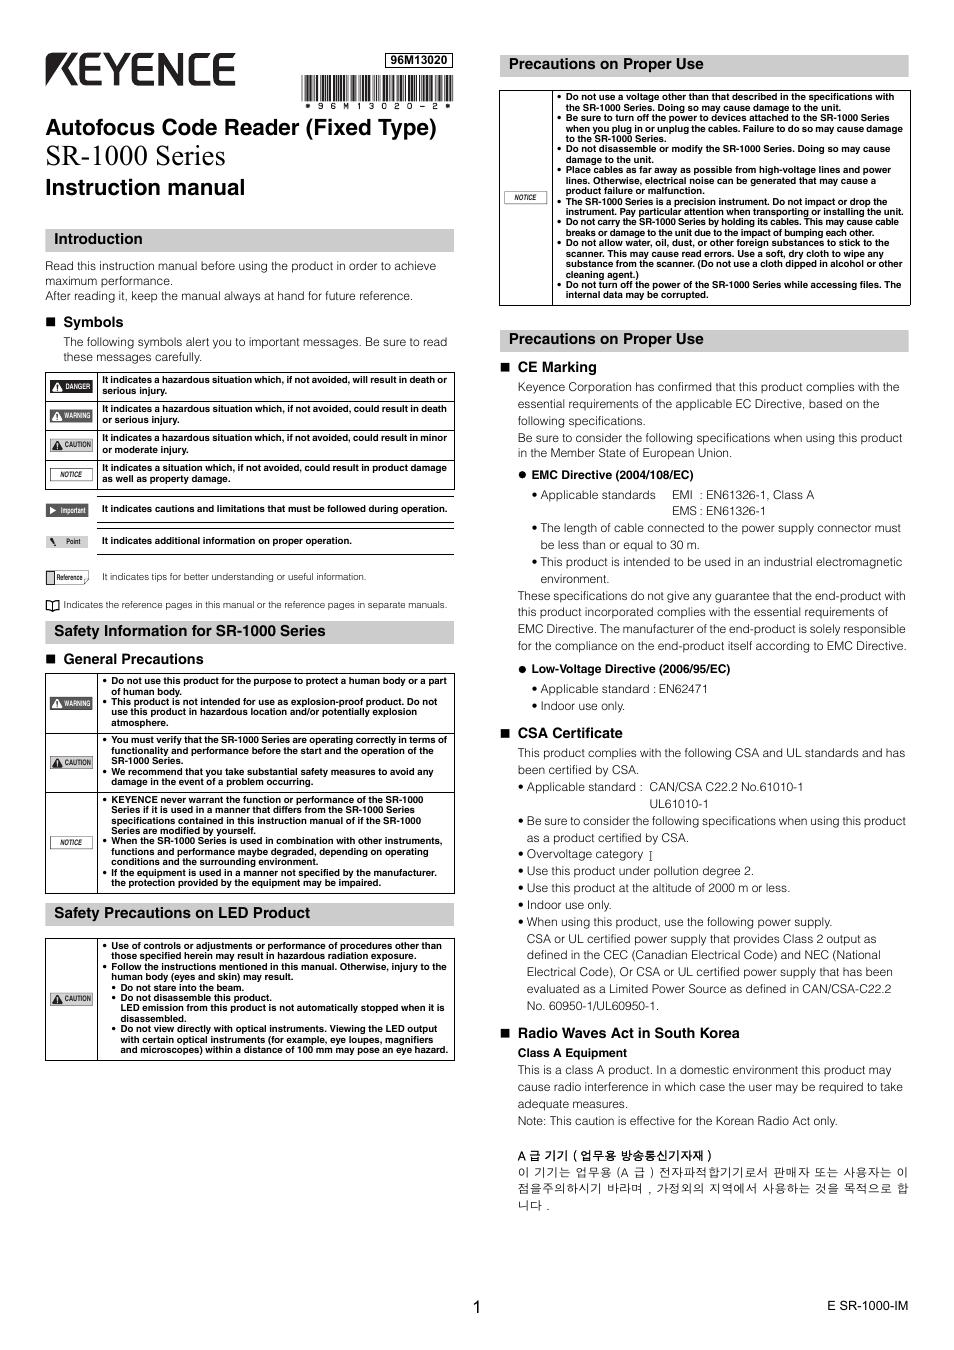 keyence sr 1000 series page1 keyence sr 1000 series user manual 6 pages KEYENCE SR1000 Mounting at mifinder.co